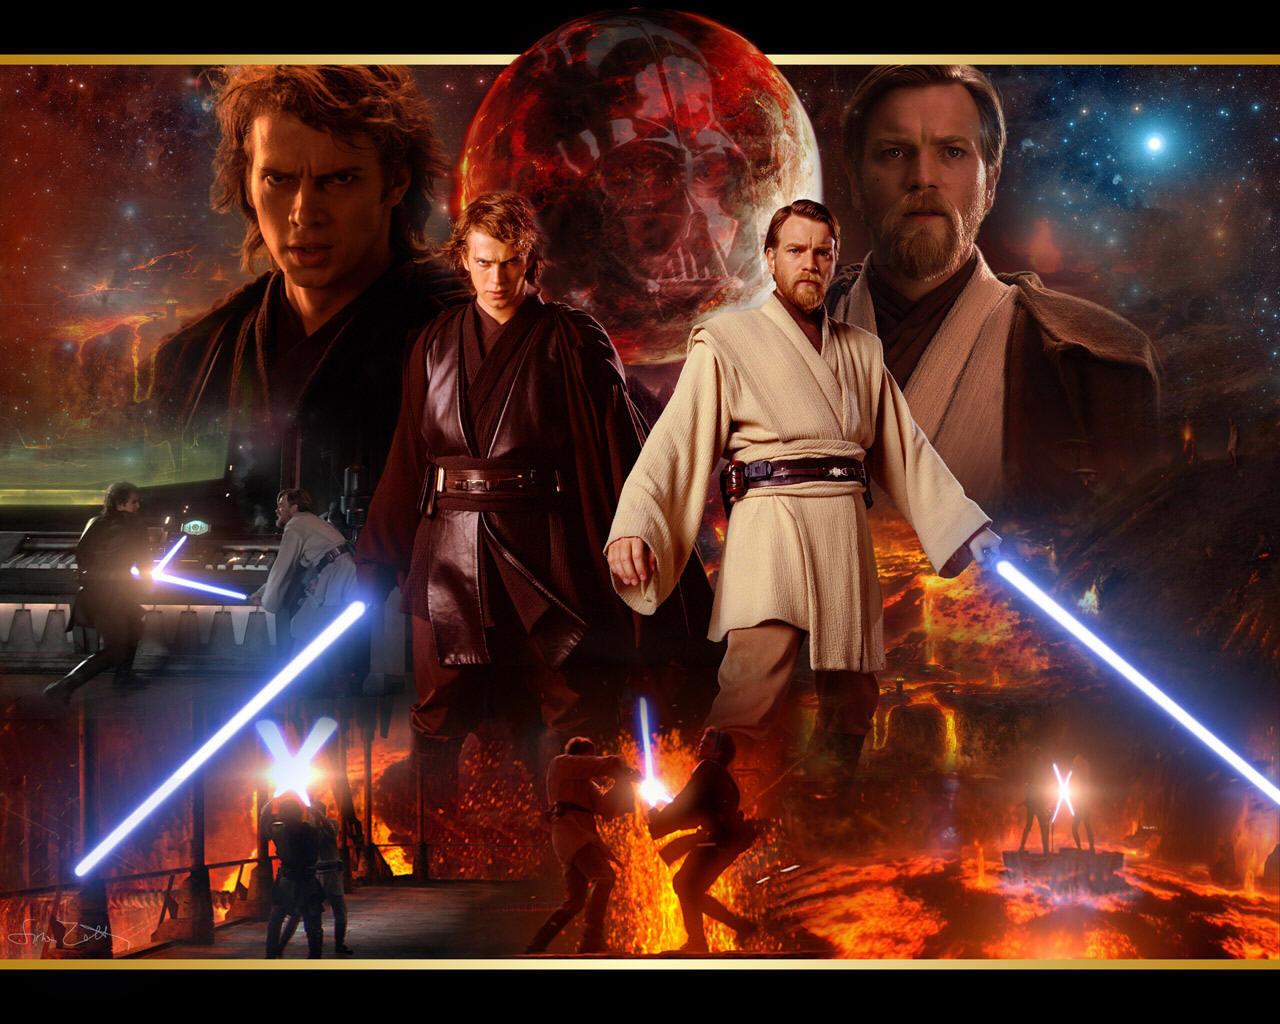 Star wars episode iii revenge of the sith